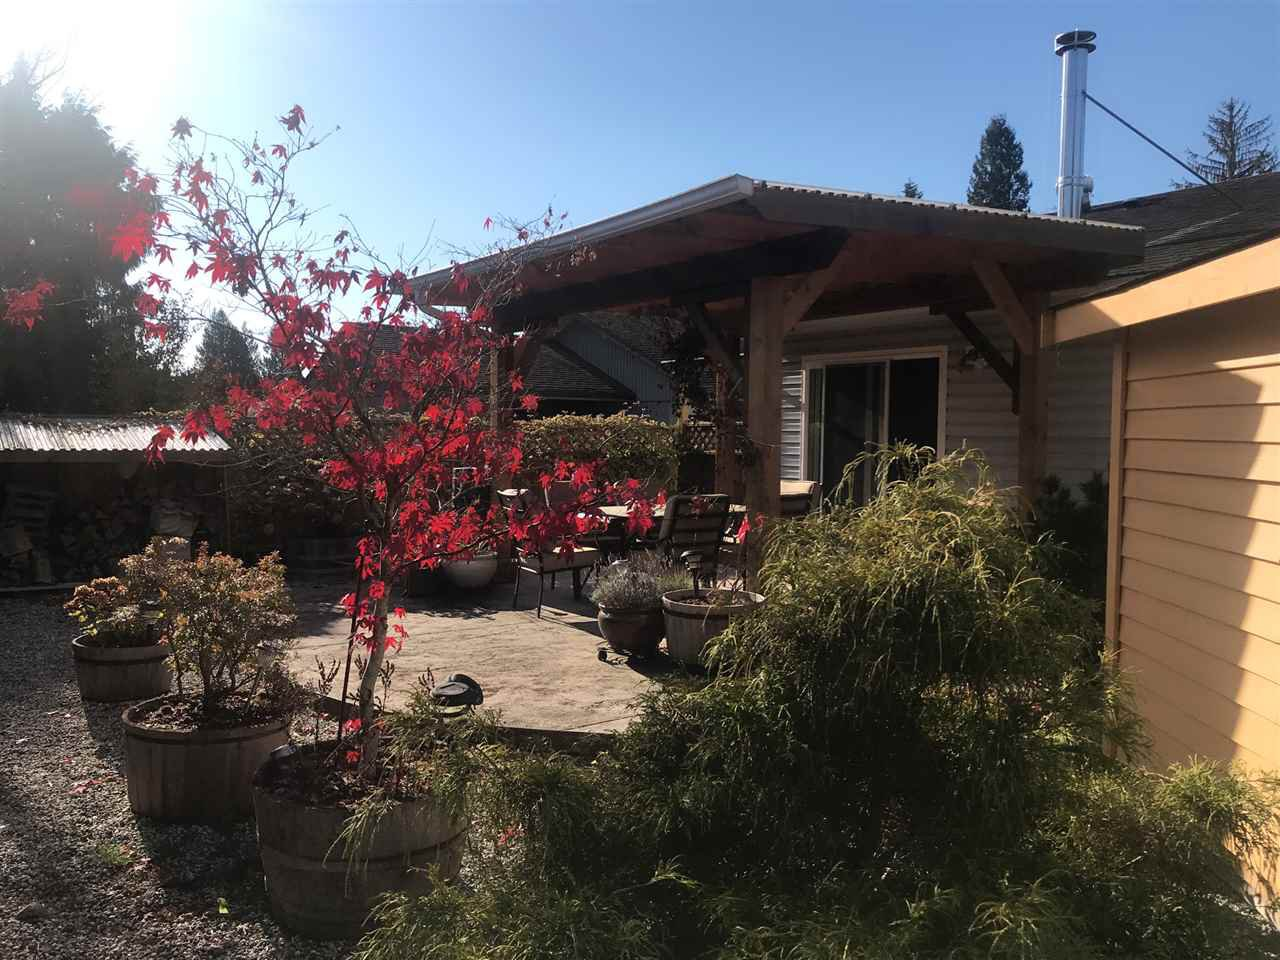 Main Photo: 5686 CREEKSIDE Place in Sechelt: Sechelt District House for sale (Sunshine Coast)  : MLS®# R2515711